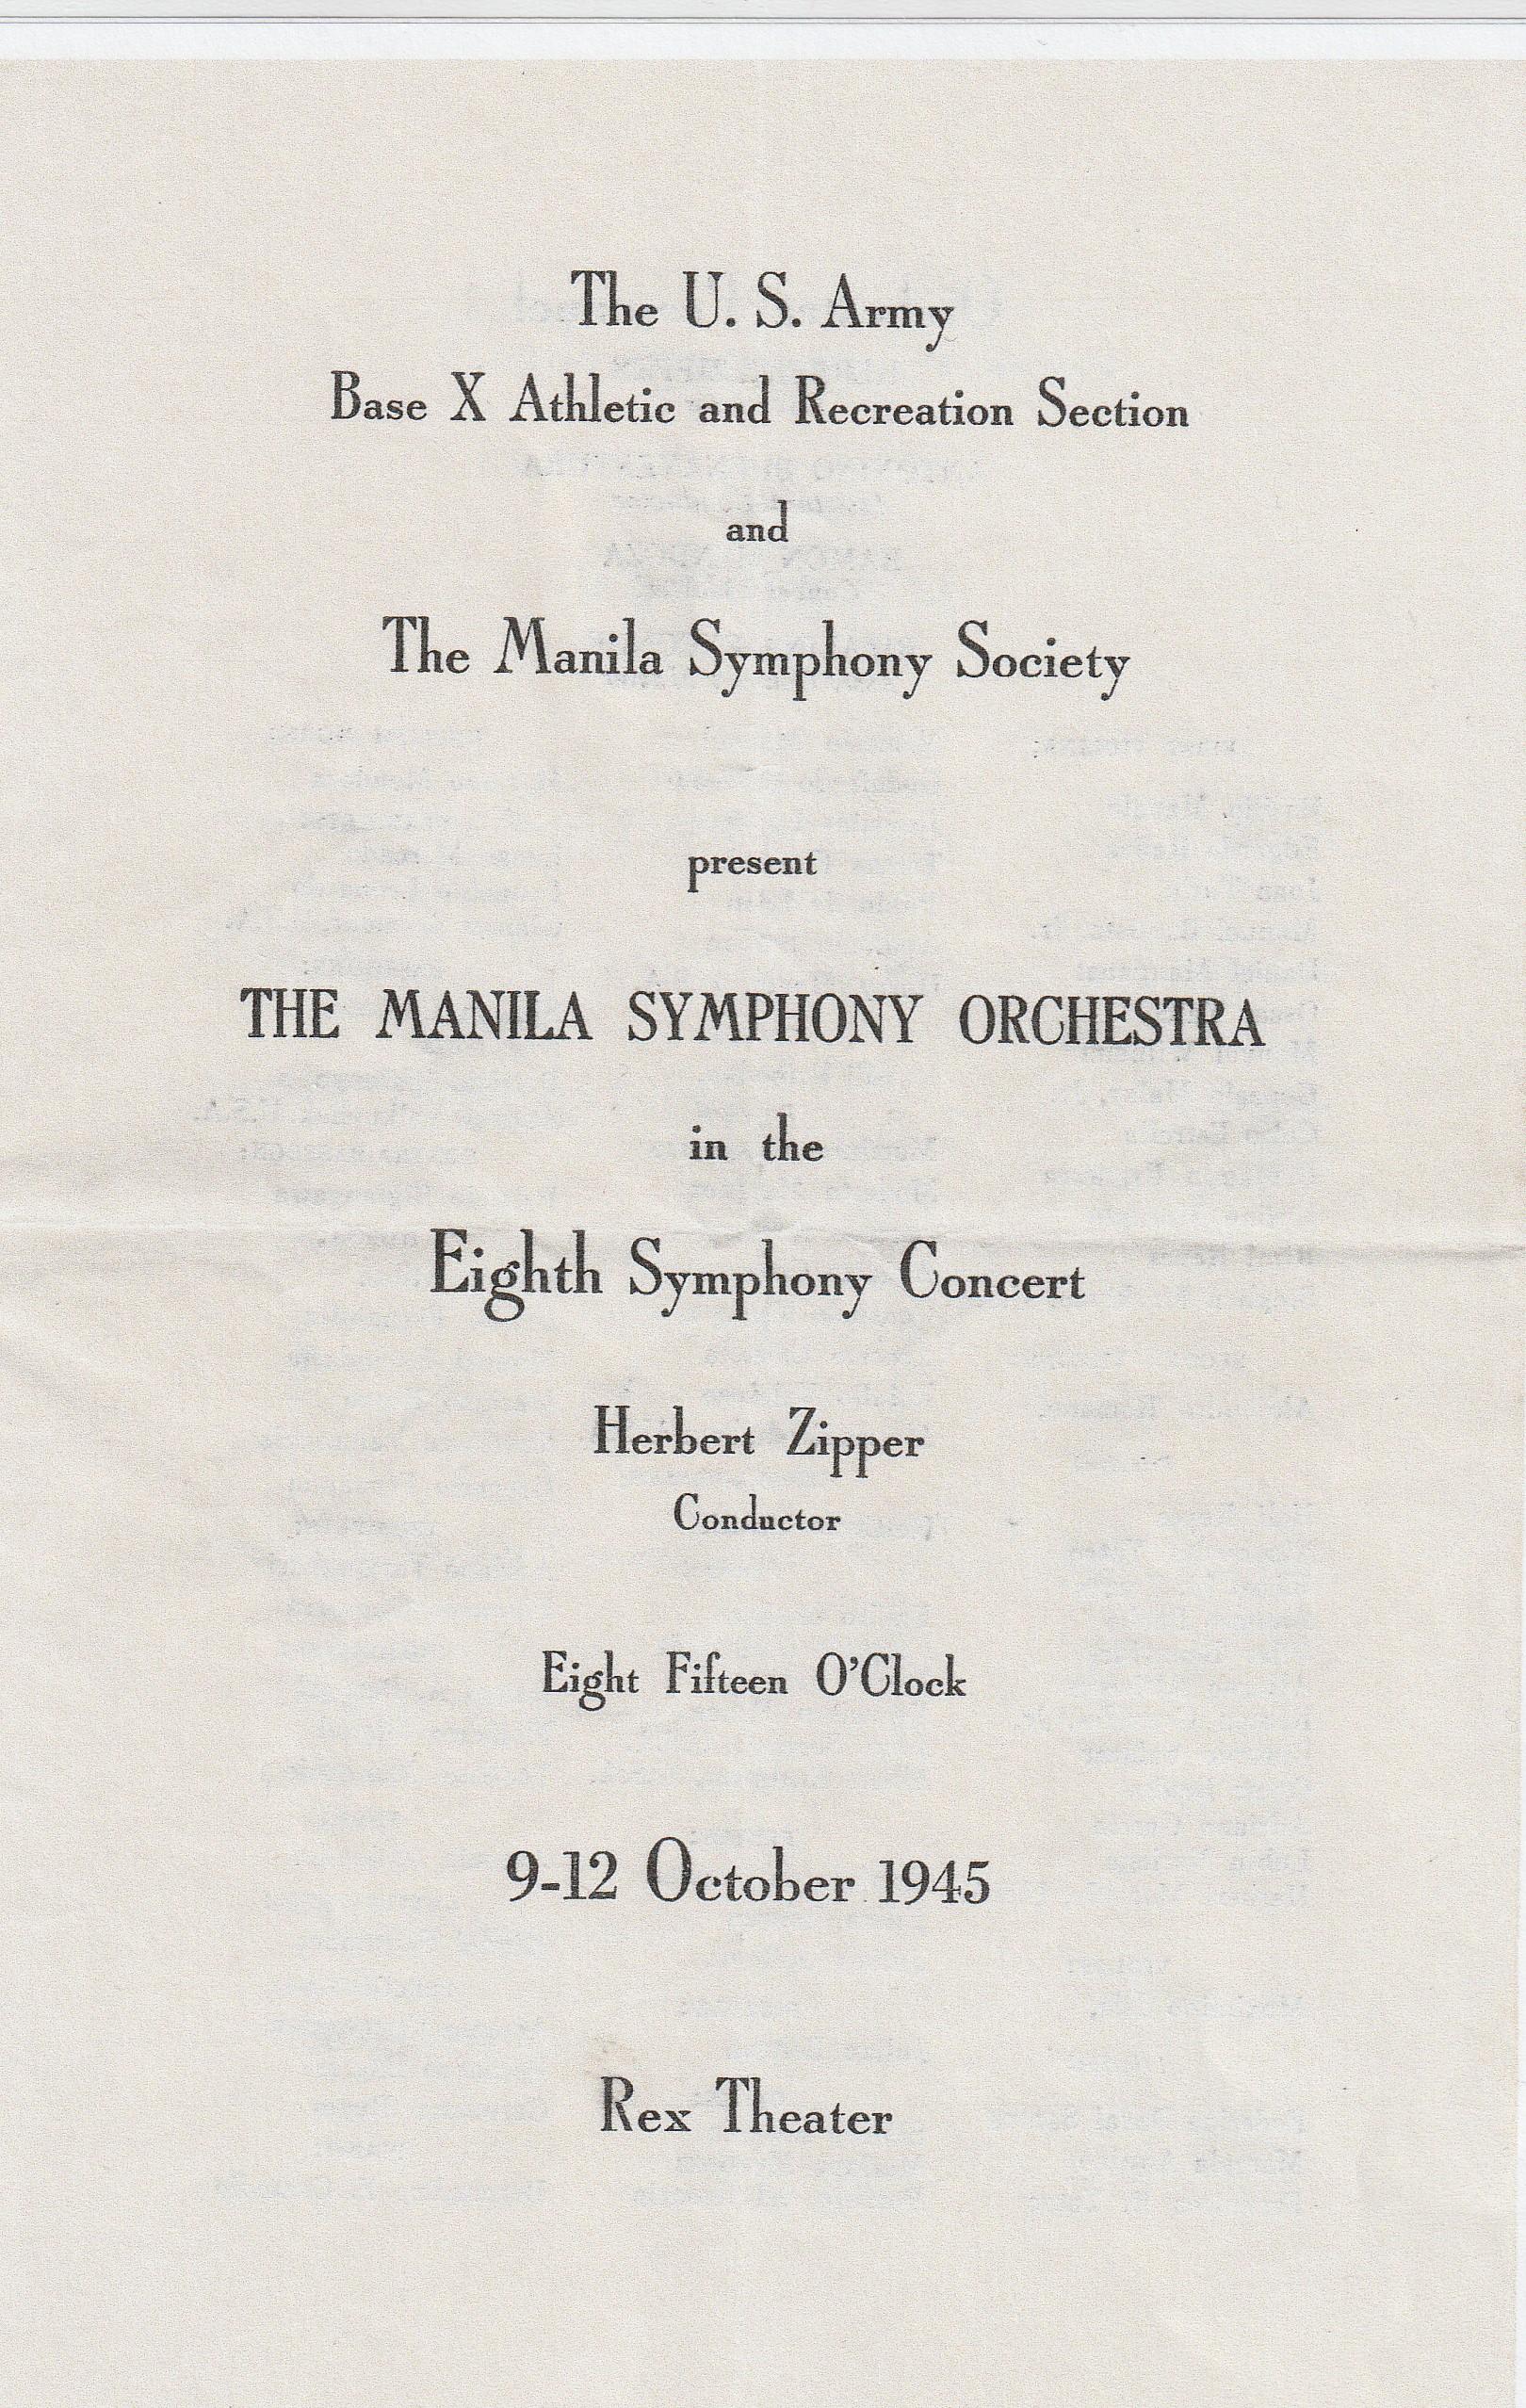 DPG - Manila Symphony Prgram - October 11, 1945